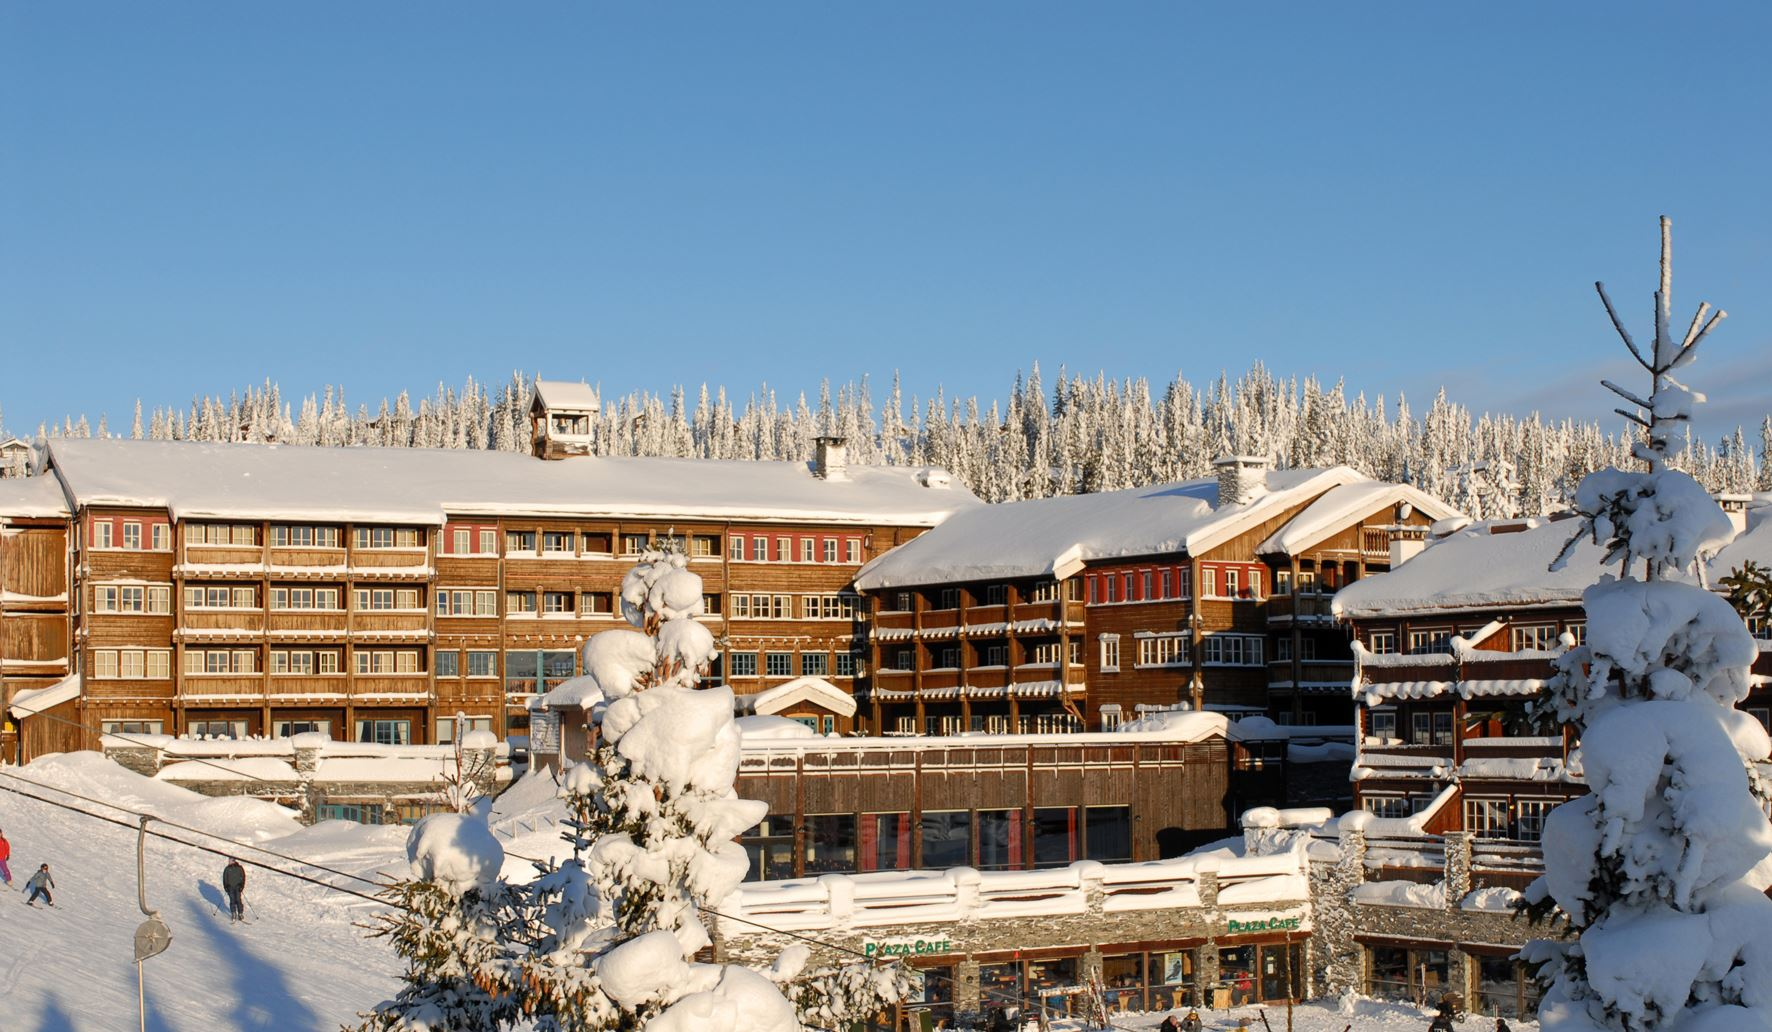 © Gudbrandsgard hotell, Gudbrandsgard Hotell